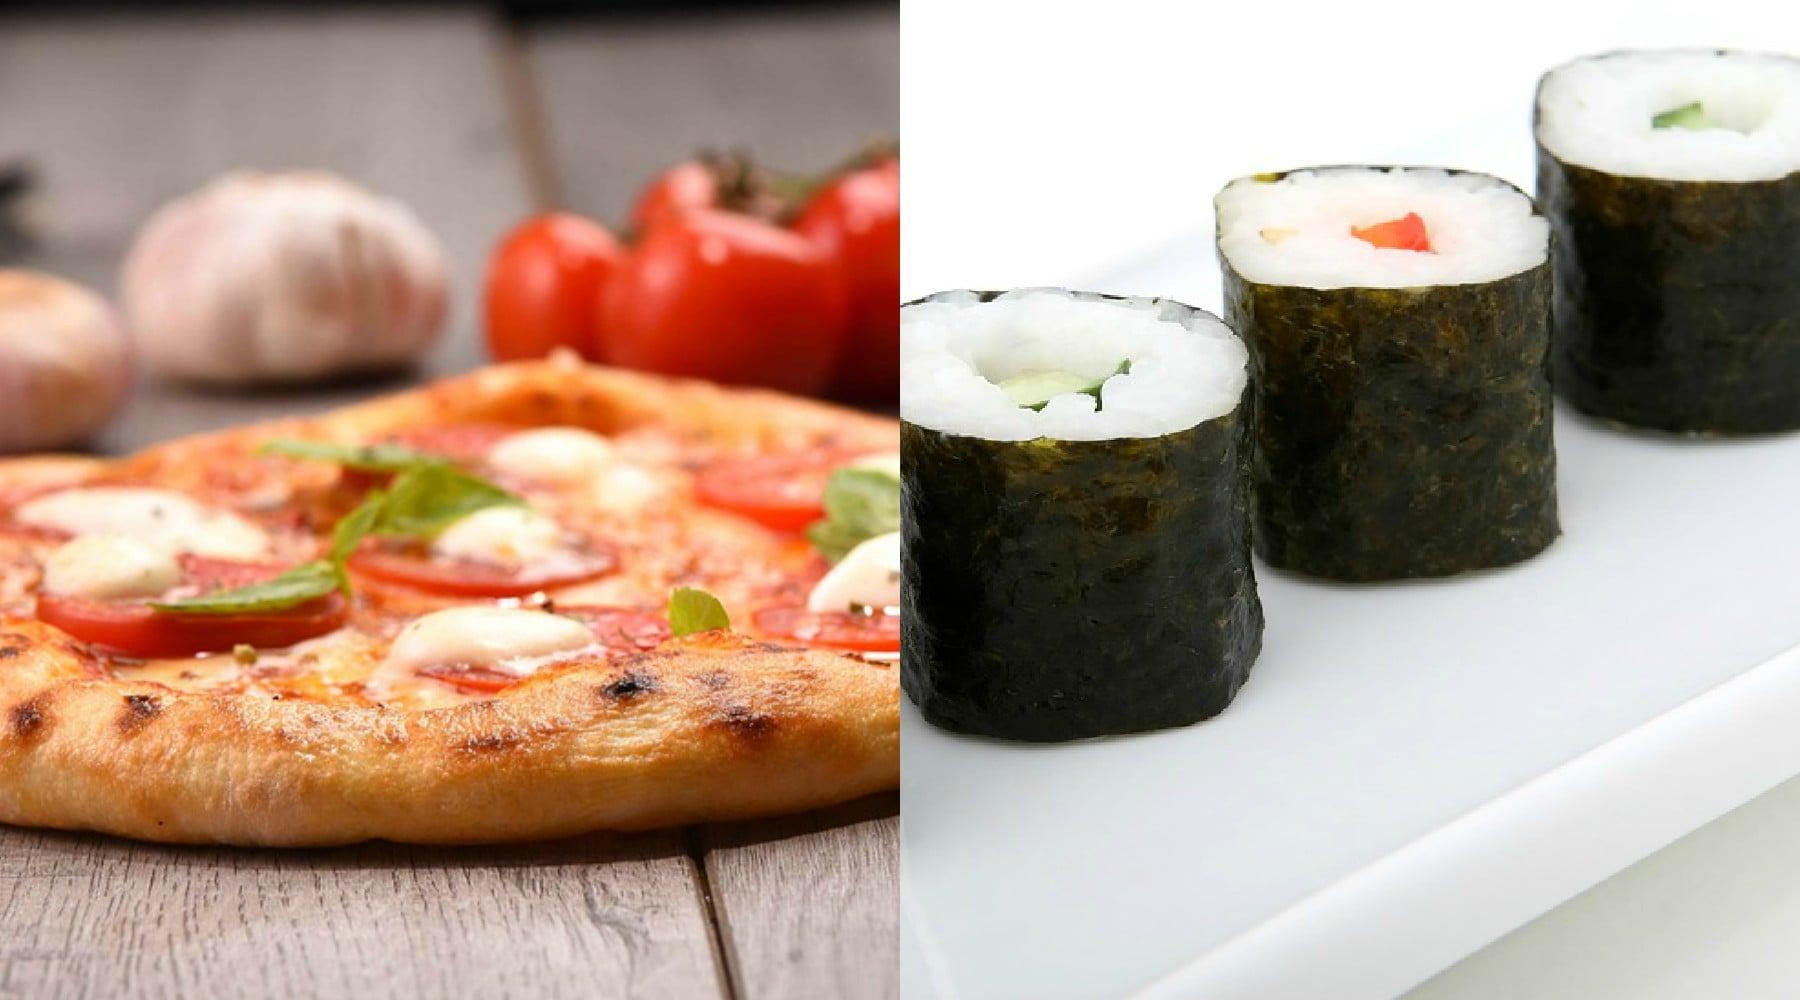 Juventus-Torino, ecco cosa mangiano i tifosi: pizza per i granata, sushi per i bianconeri